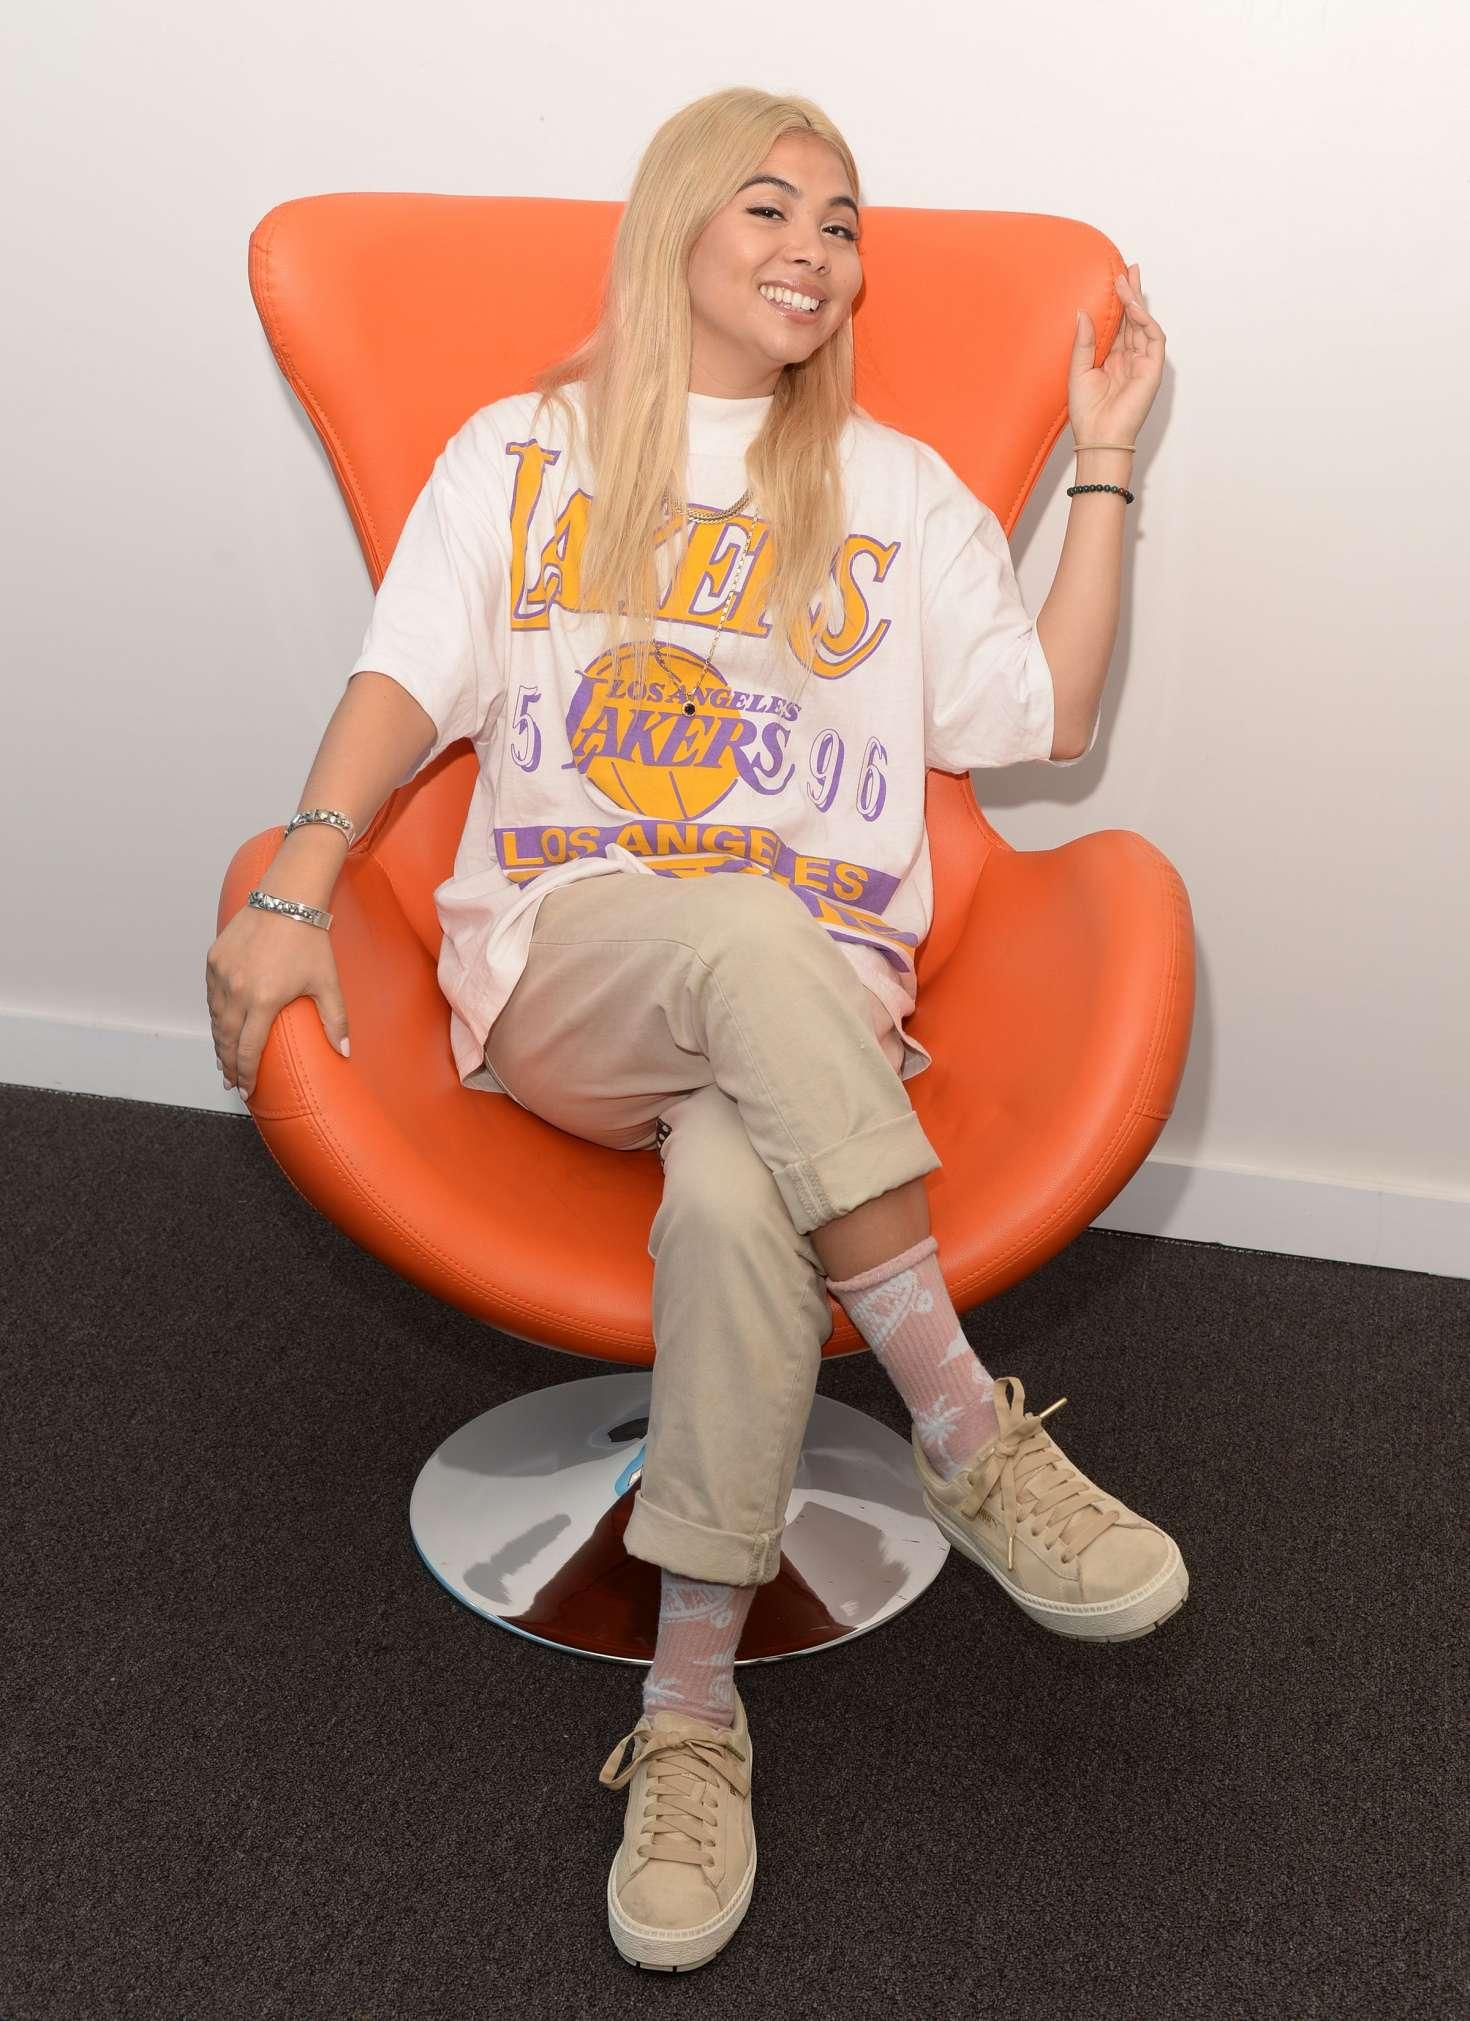 Hayley Kiyoko at Hits 97.3 Radio Station -03 | GotCeleb